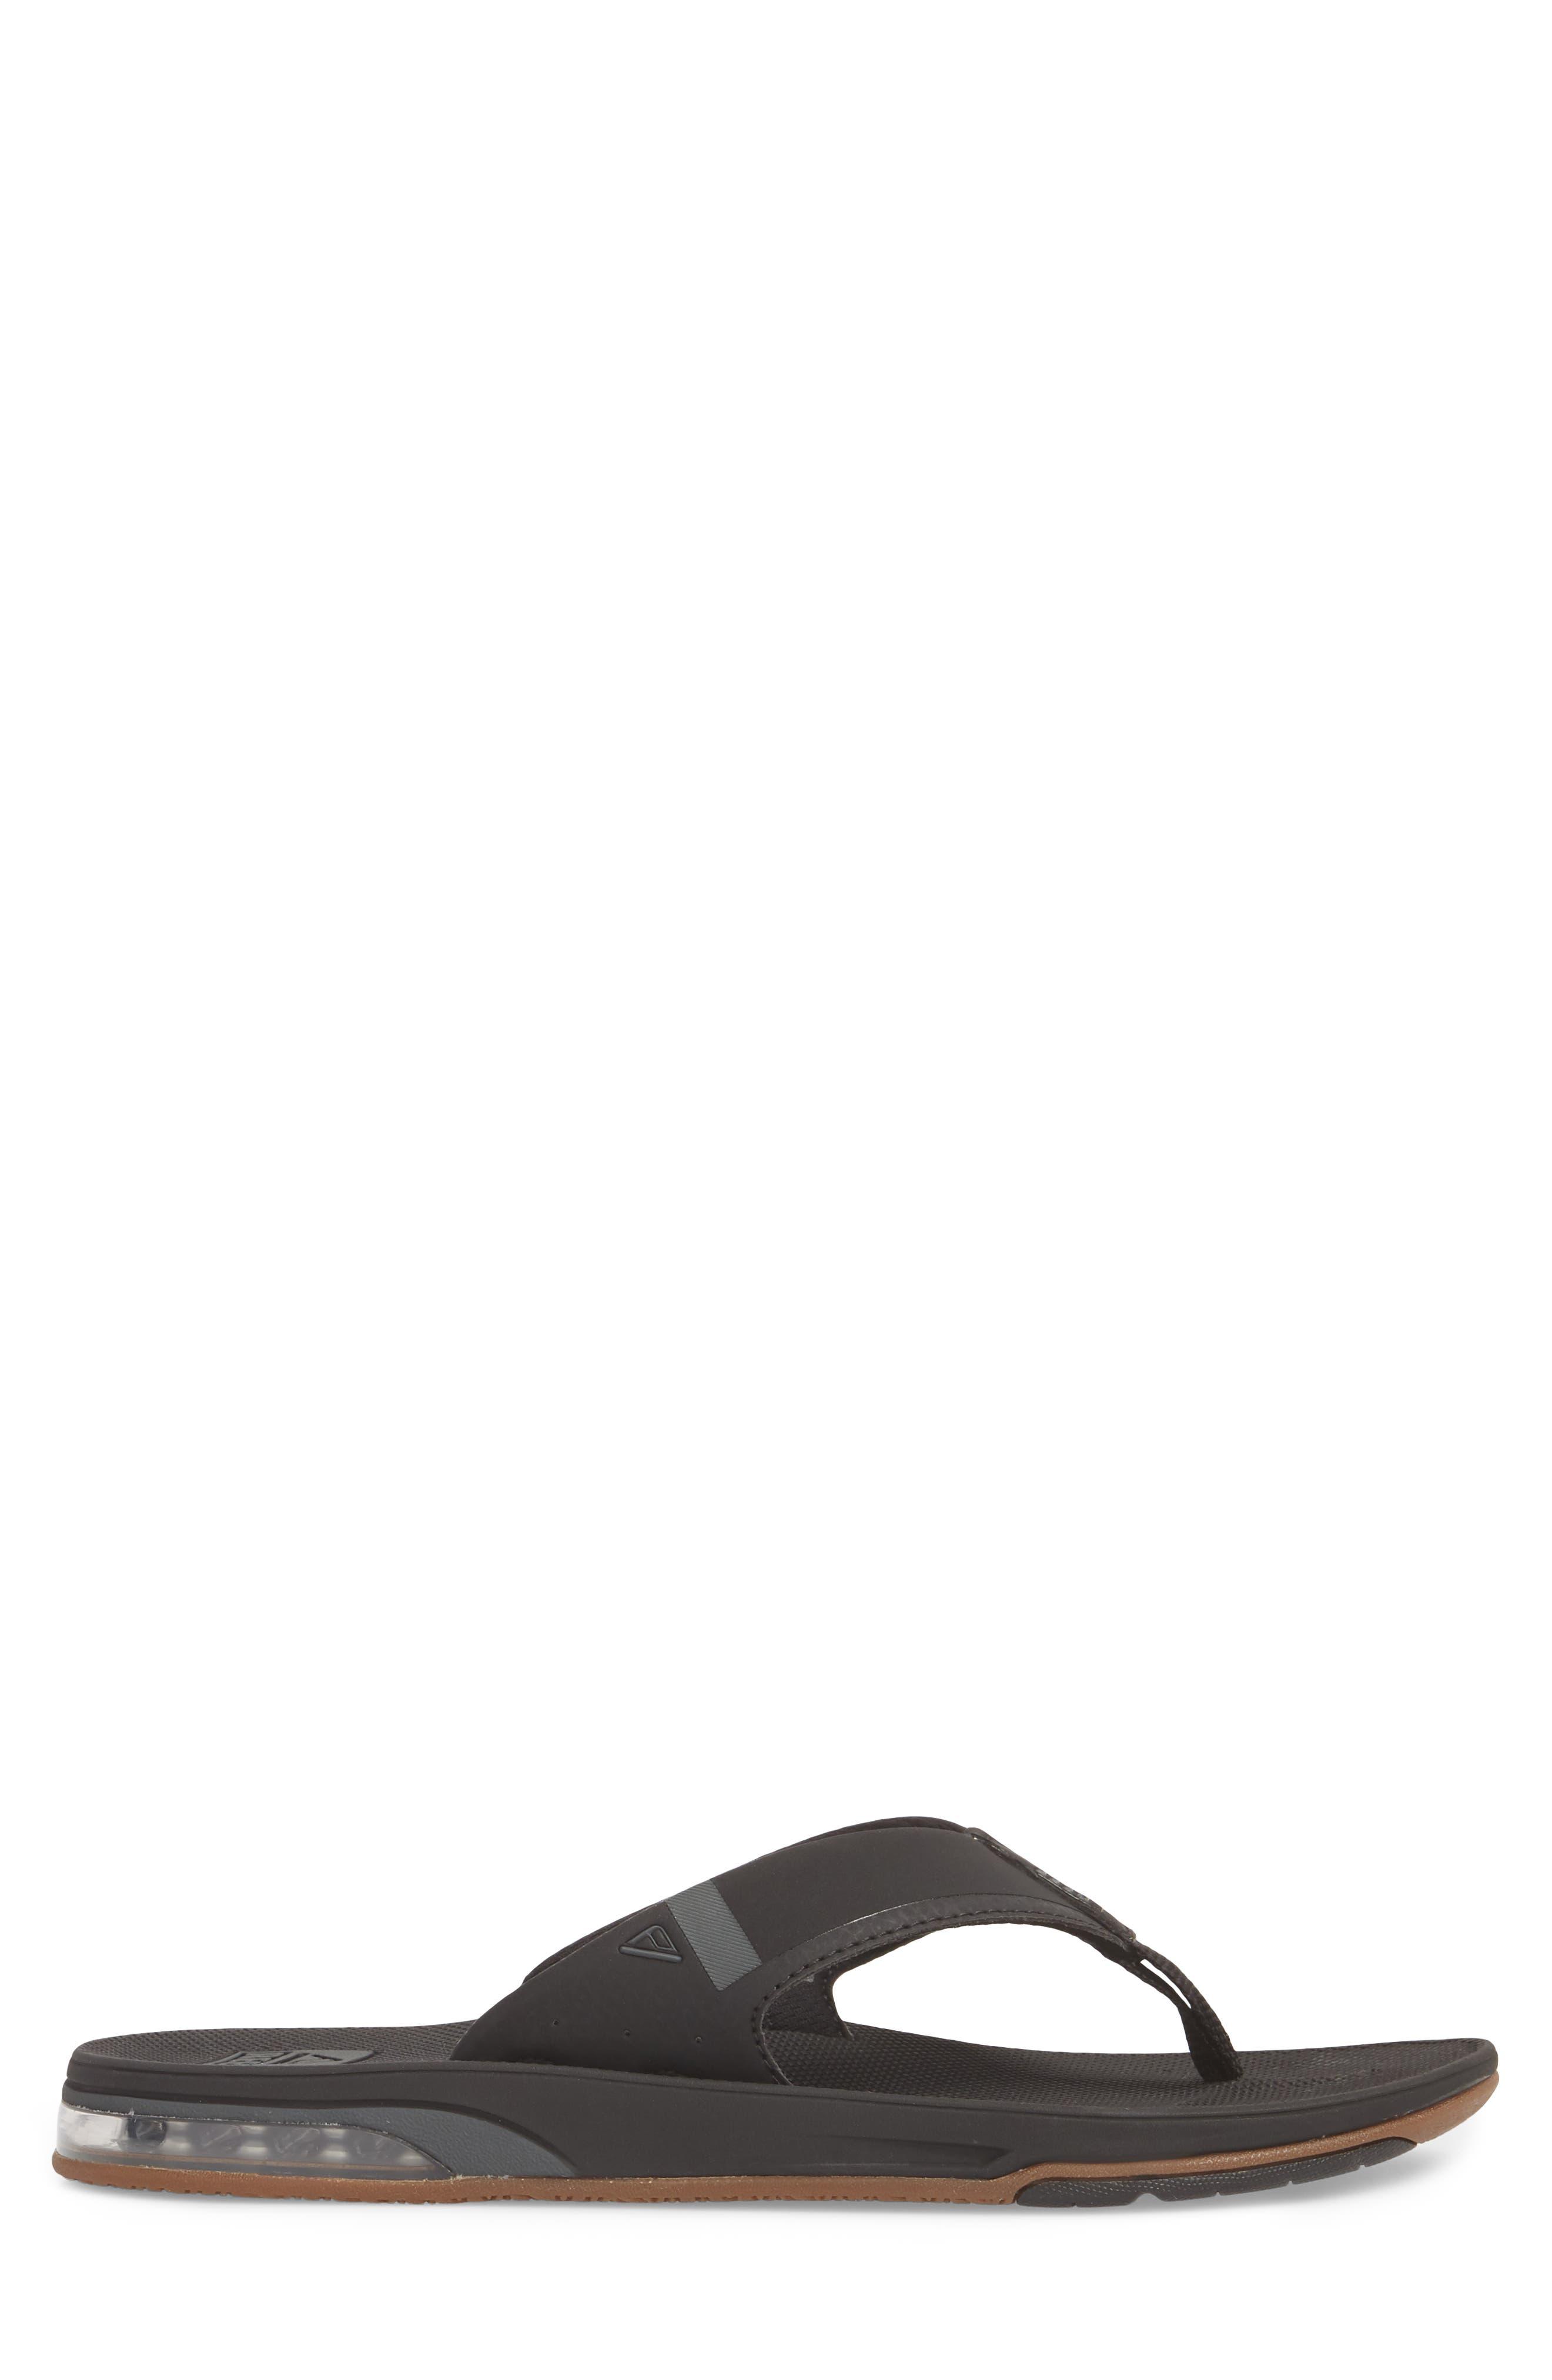 REEF, Fanning Low Flip Flop, Alternate thumbnail 3, color, BLACK